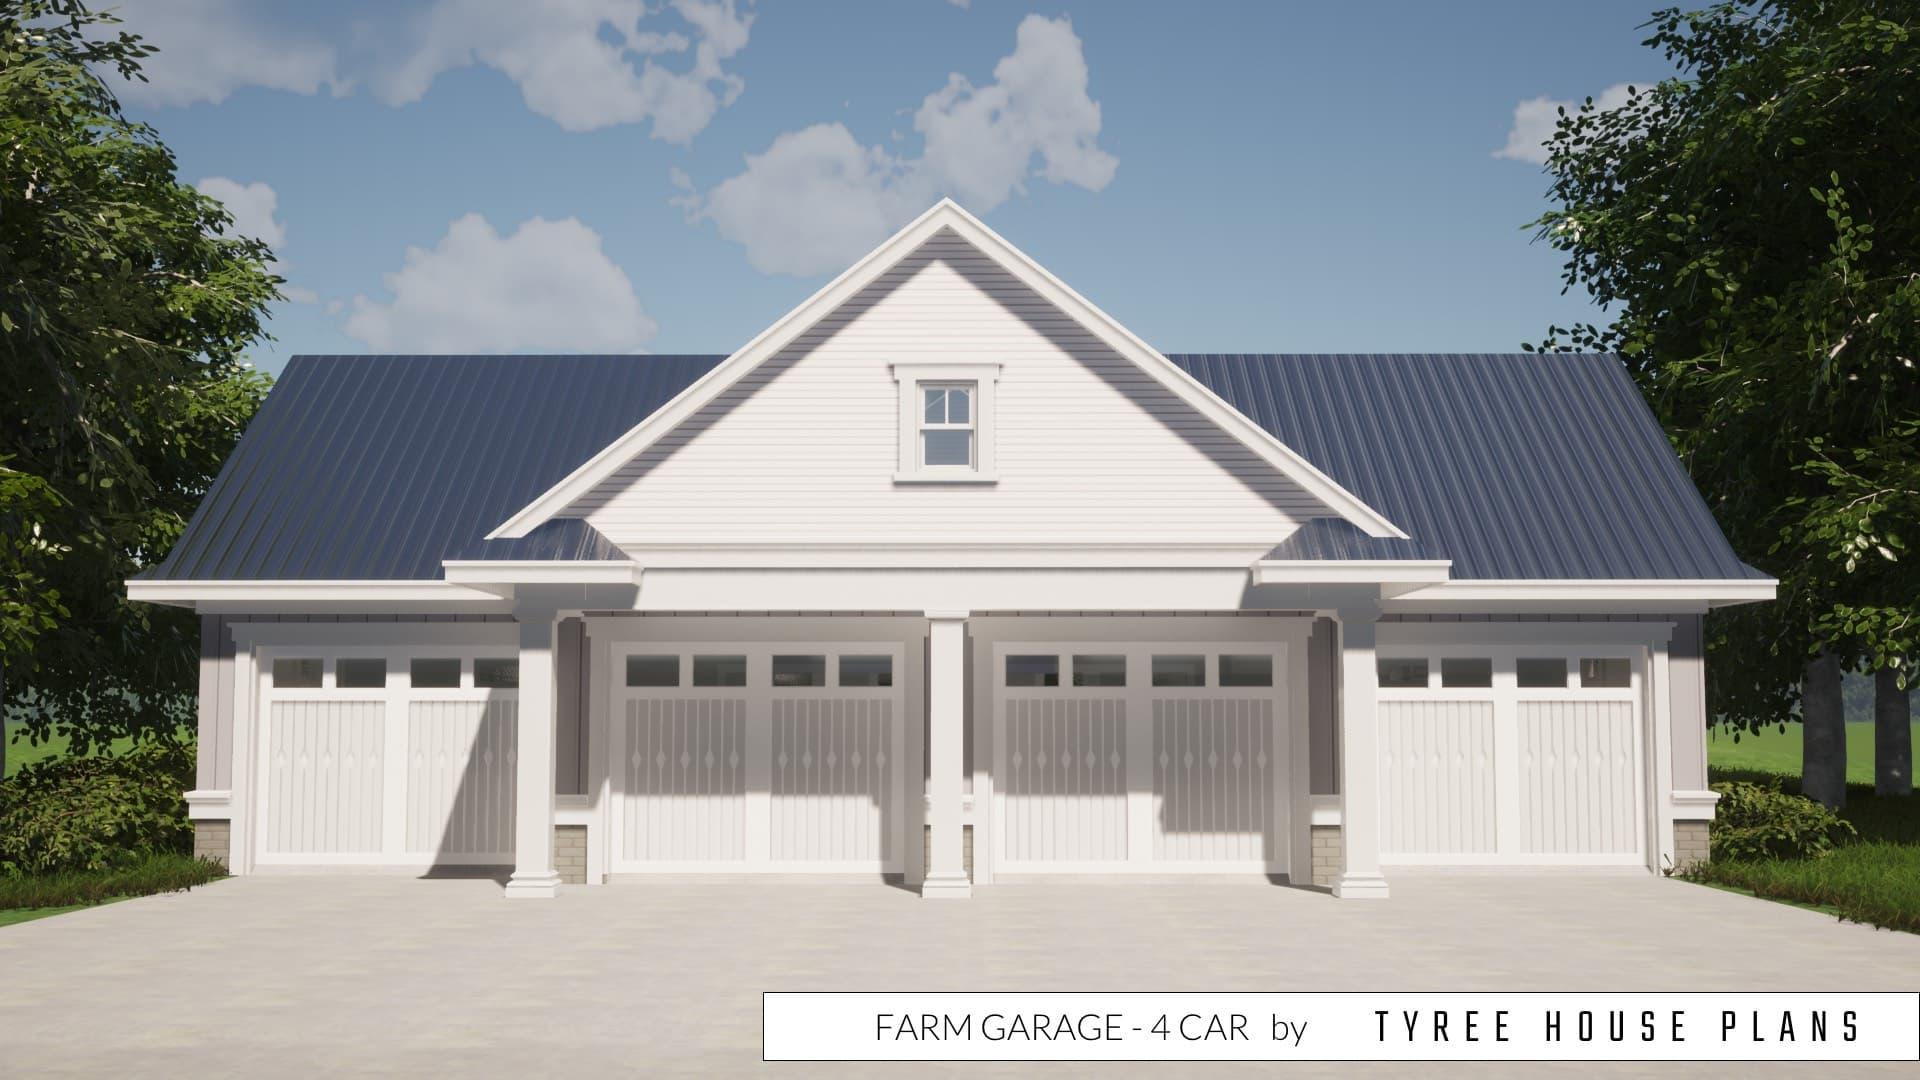 Farm Garage Plan - 4 Car by Tyree House Plans